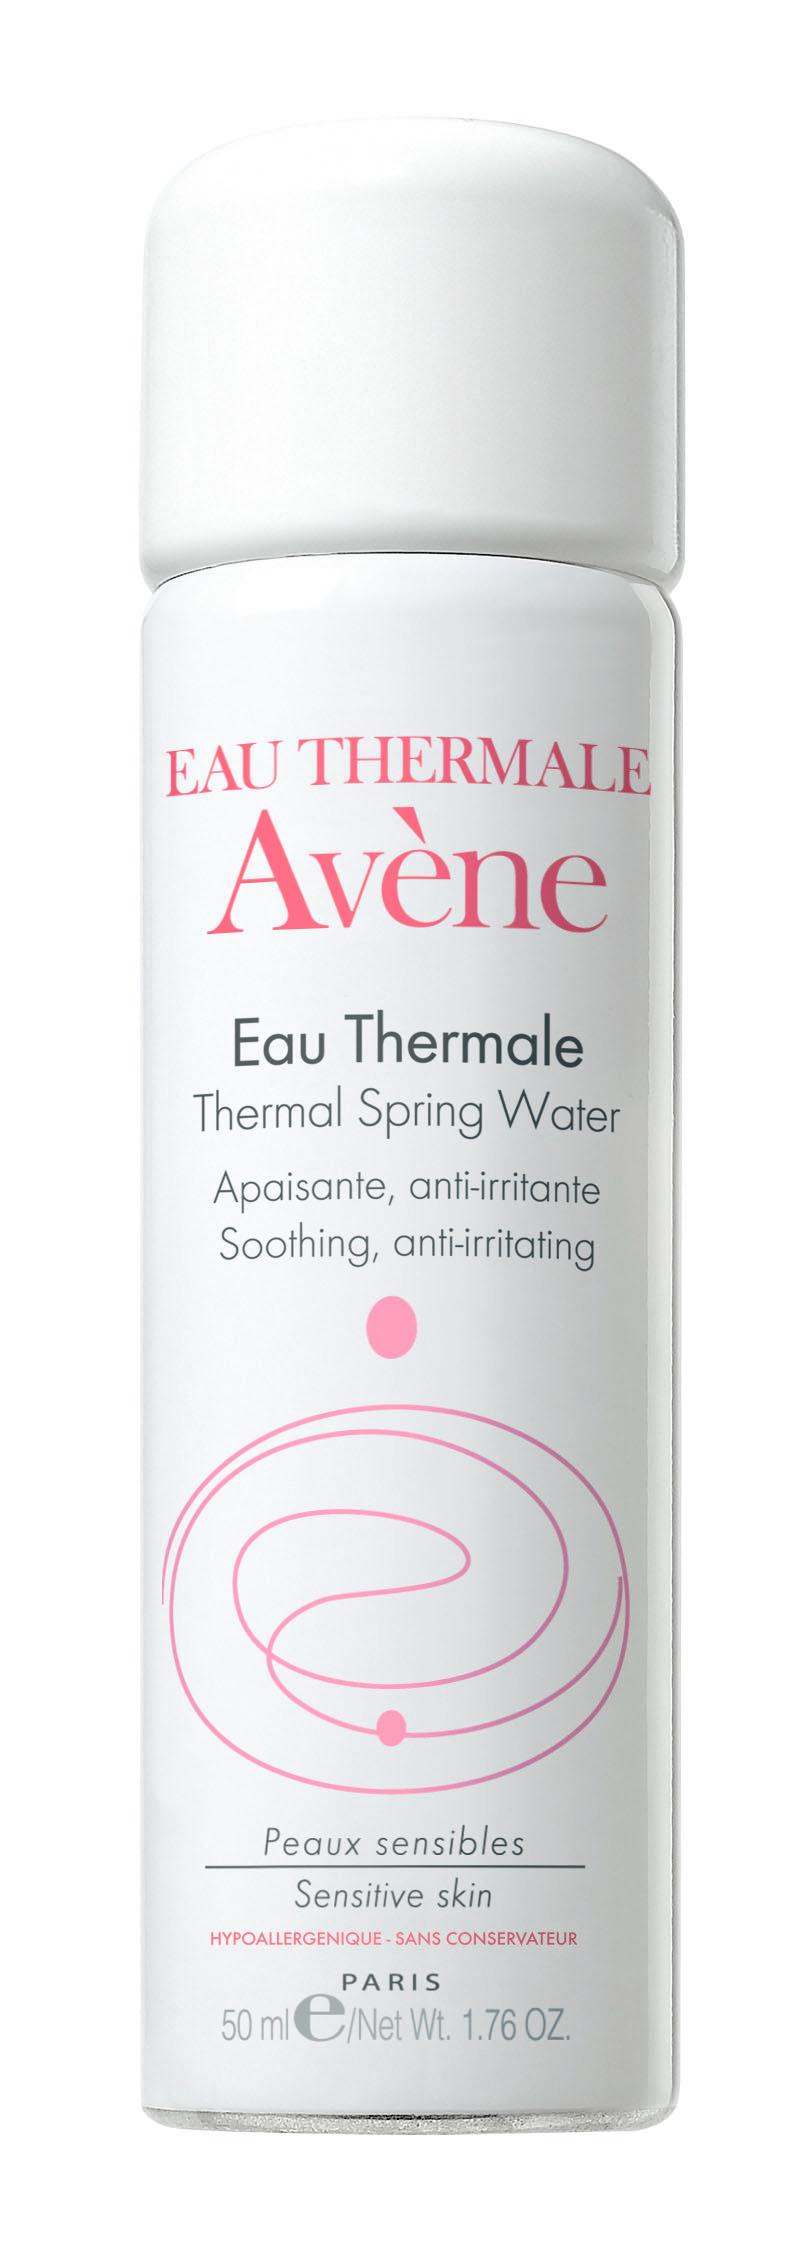 Image AVENE eau thermale